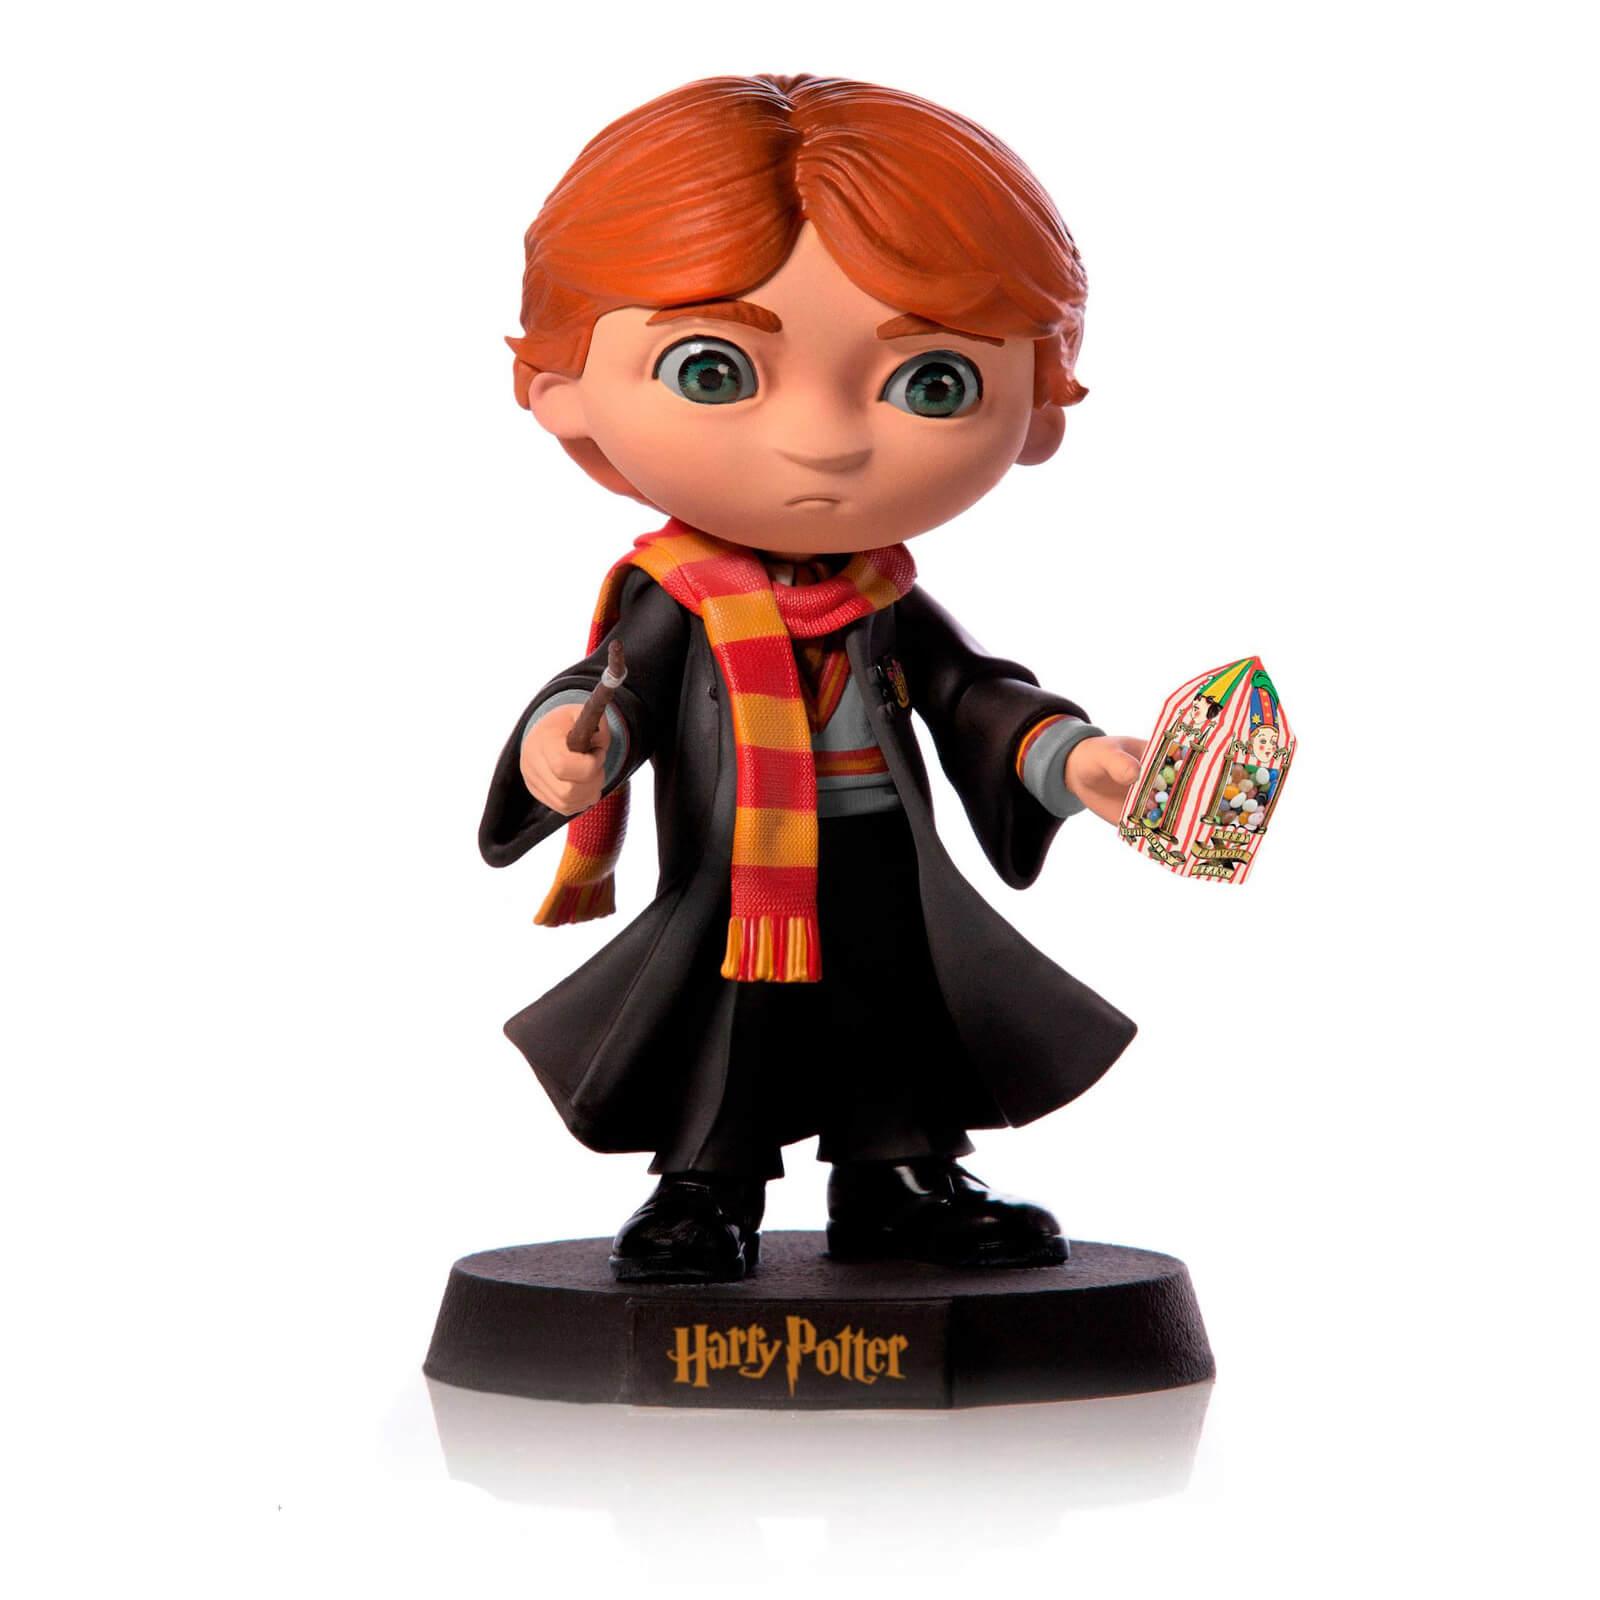 Image of Iron Studios Harry Potter Mini Co. PVC Figure Ron Weasley 12 cm